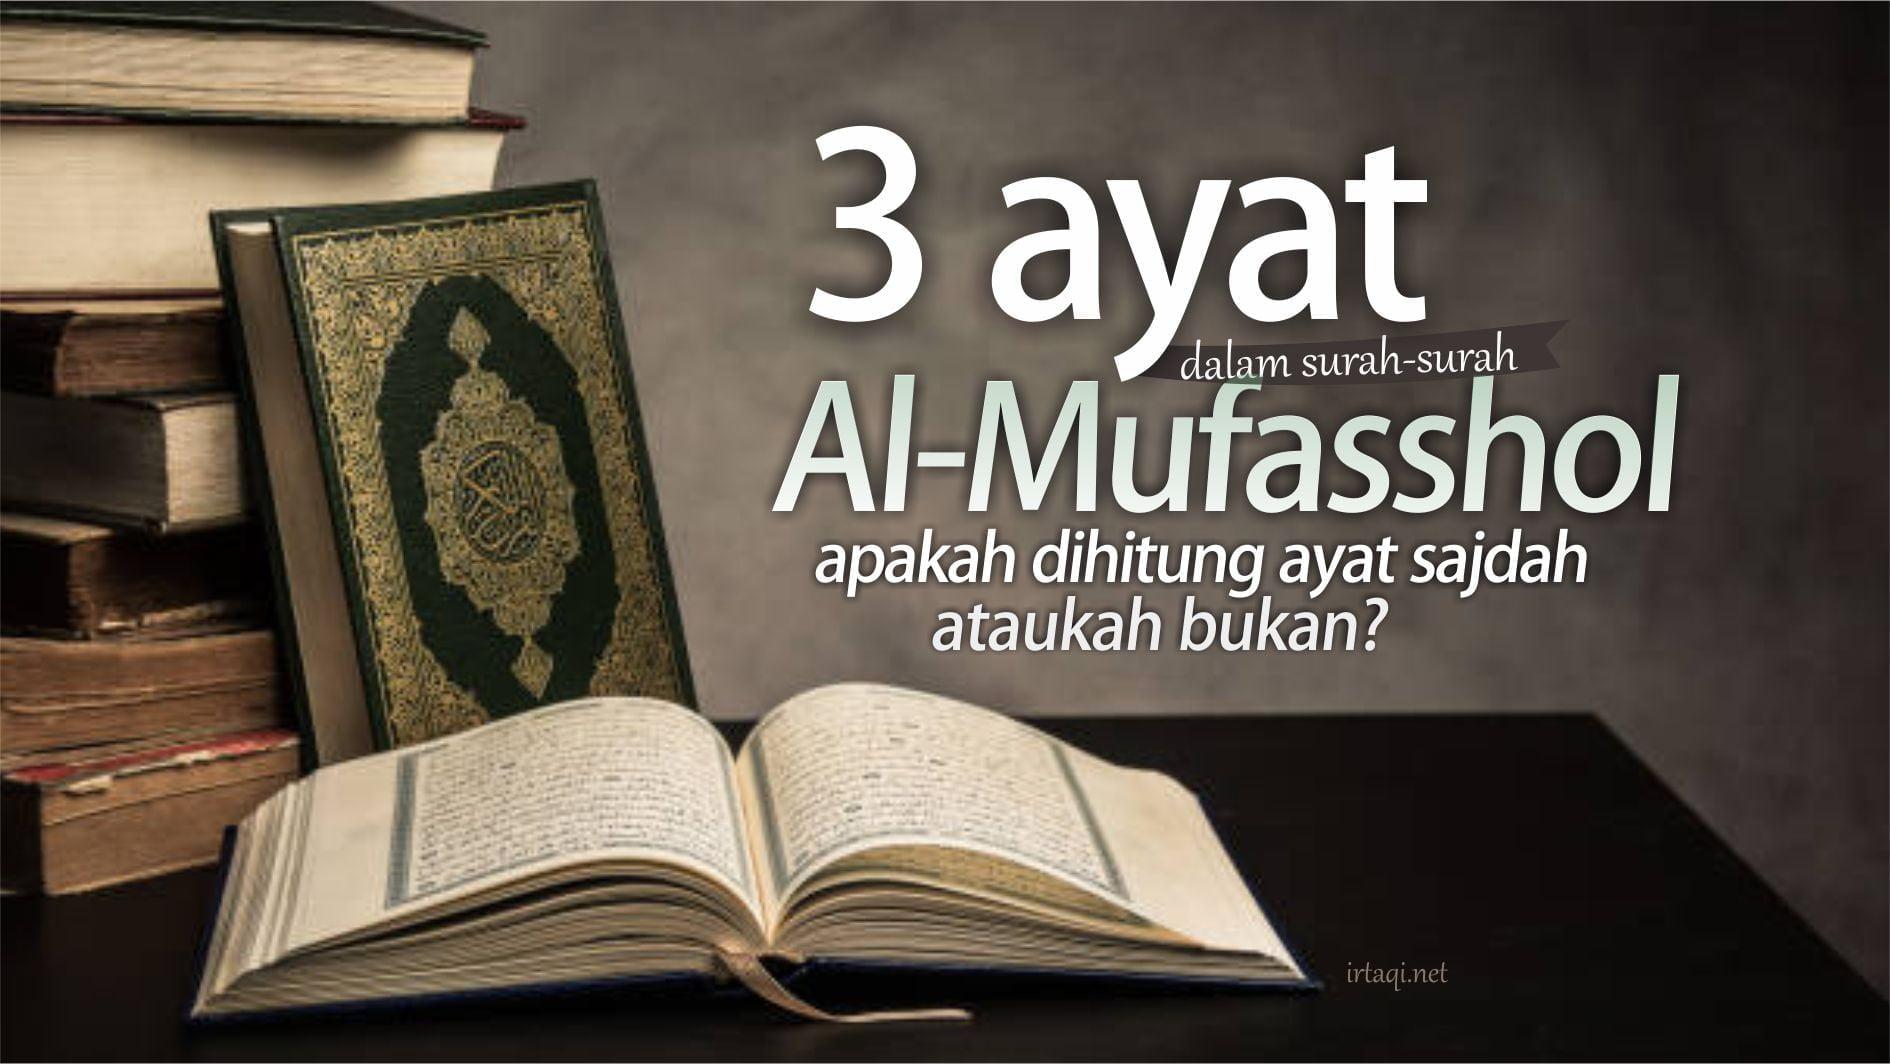 TIGA AYAT DALAM SURAH-SURAH AL-MUFASSHOL APAKAH DIHITUNG AYAT SAJDAH ATAUKAH BUKAN?